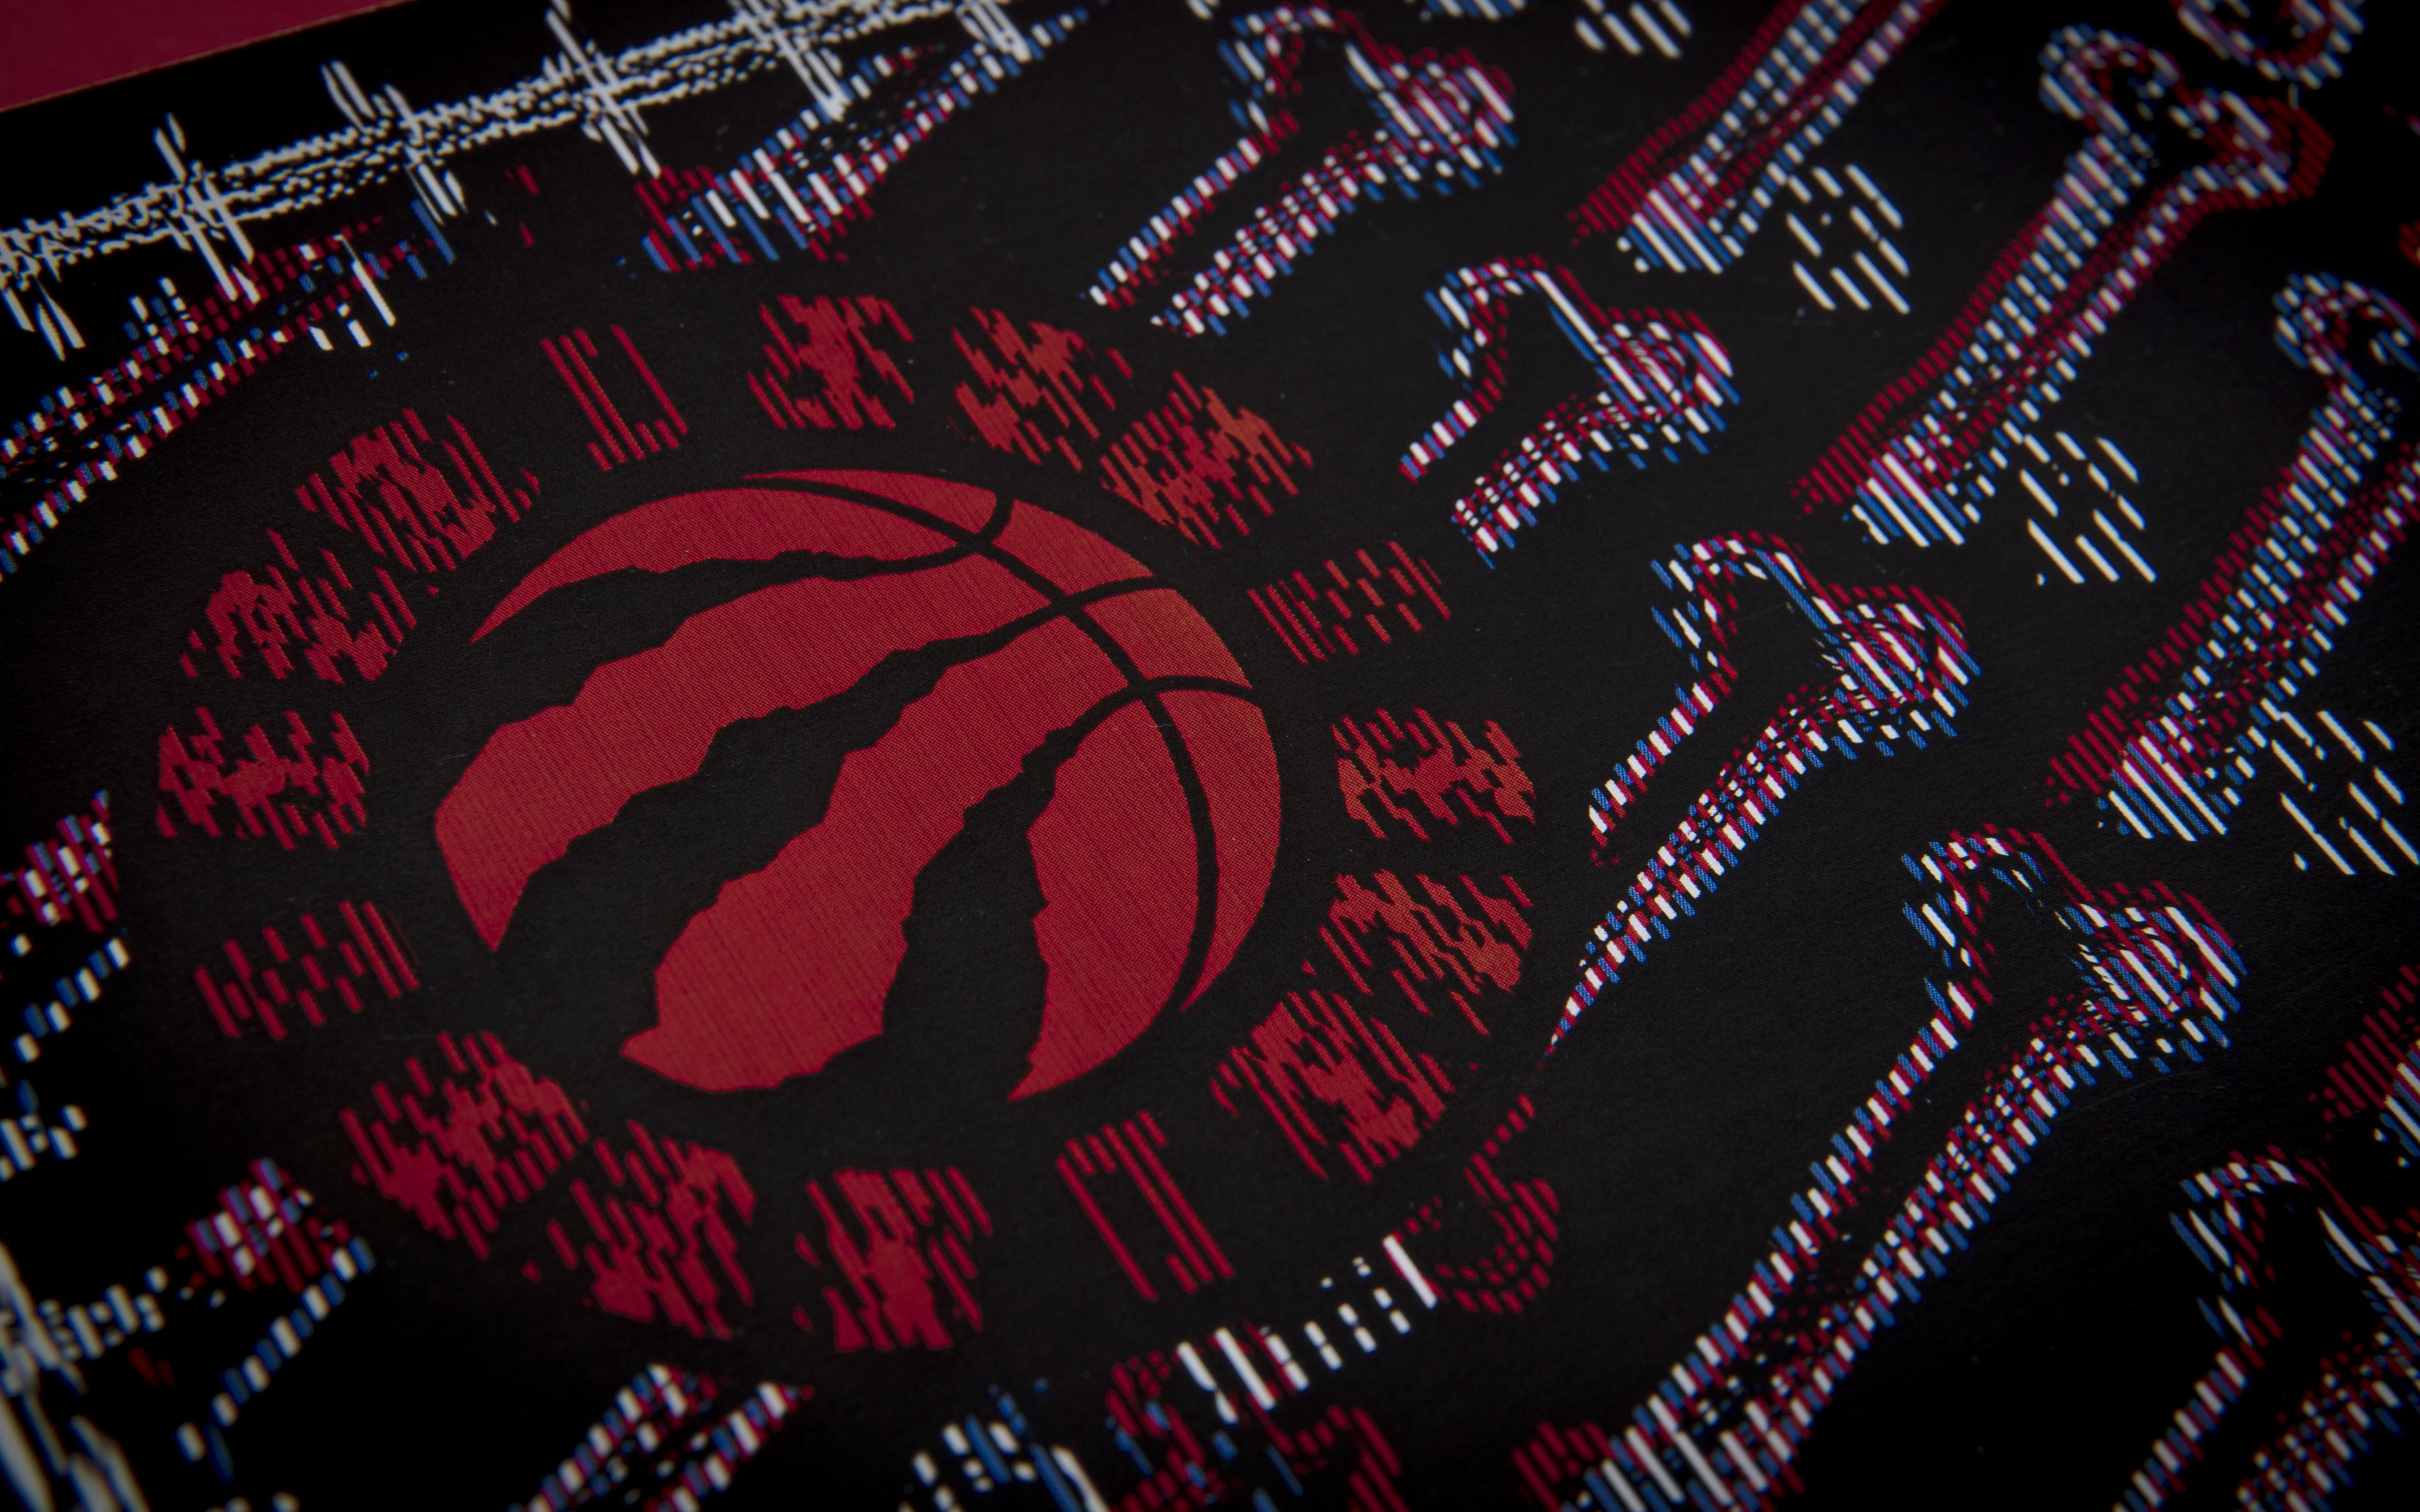 Thumbnail for Toronto Raptors 2016-17 Season Ticket Package